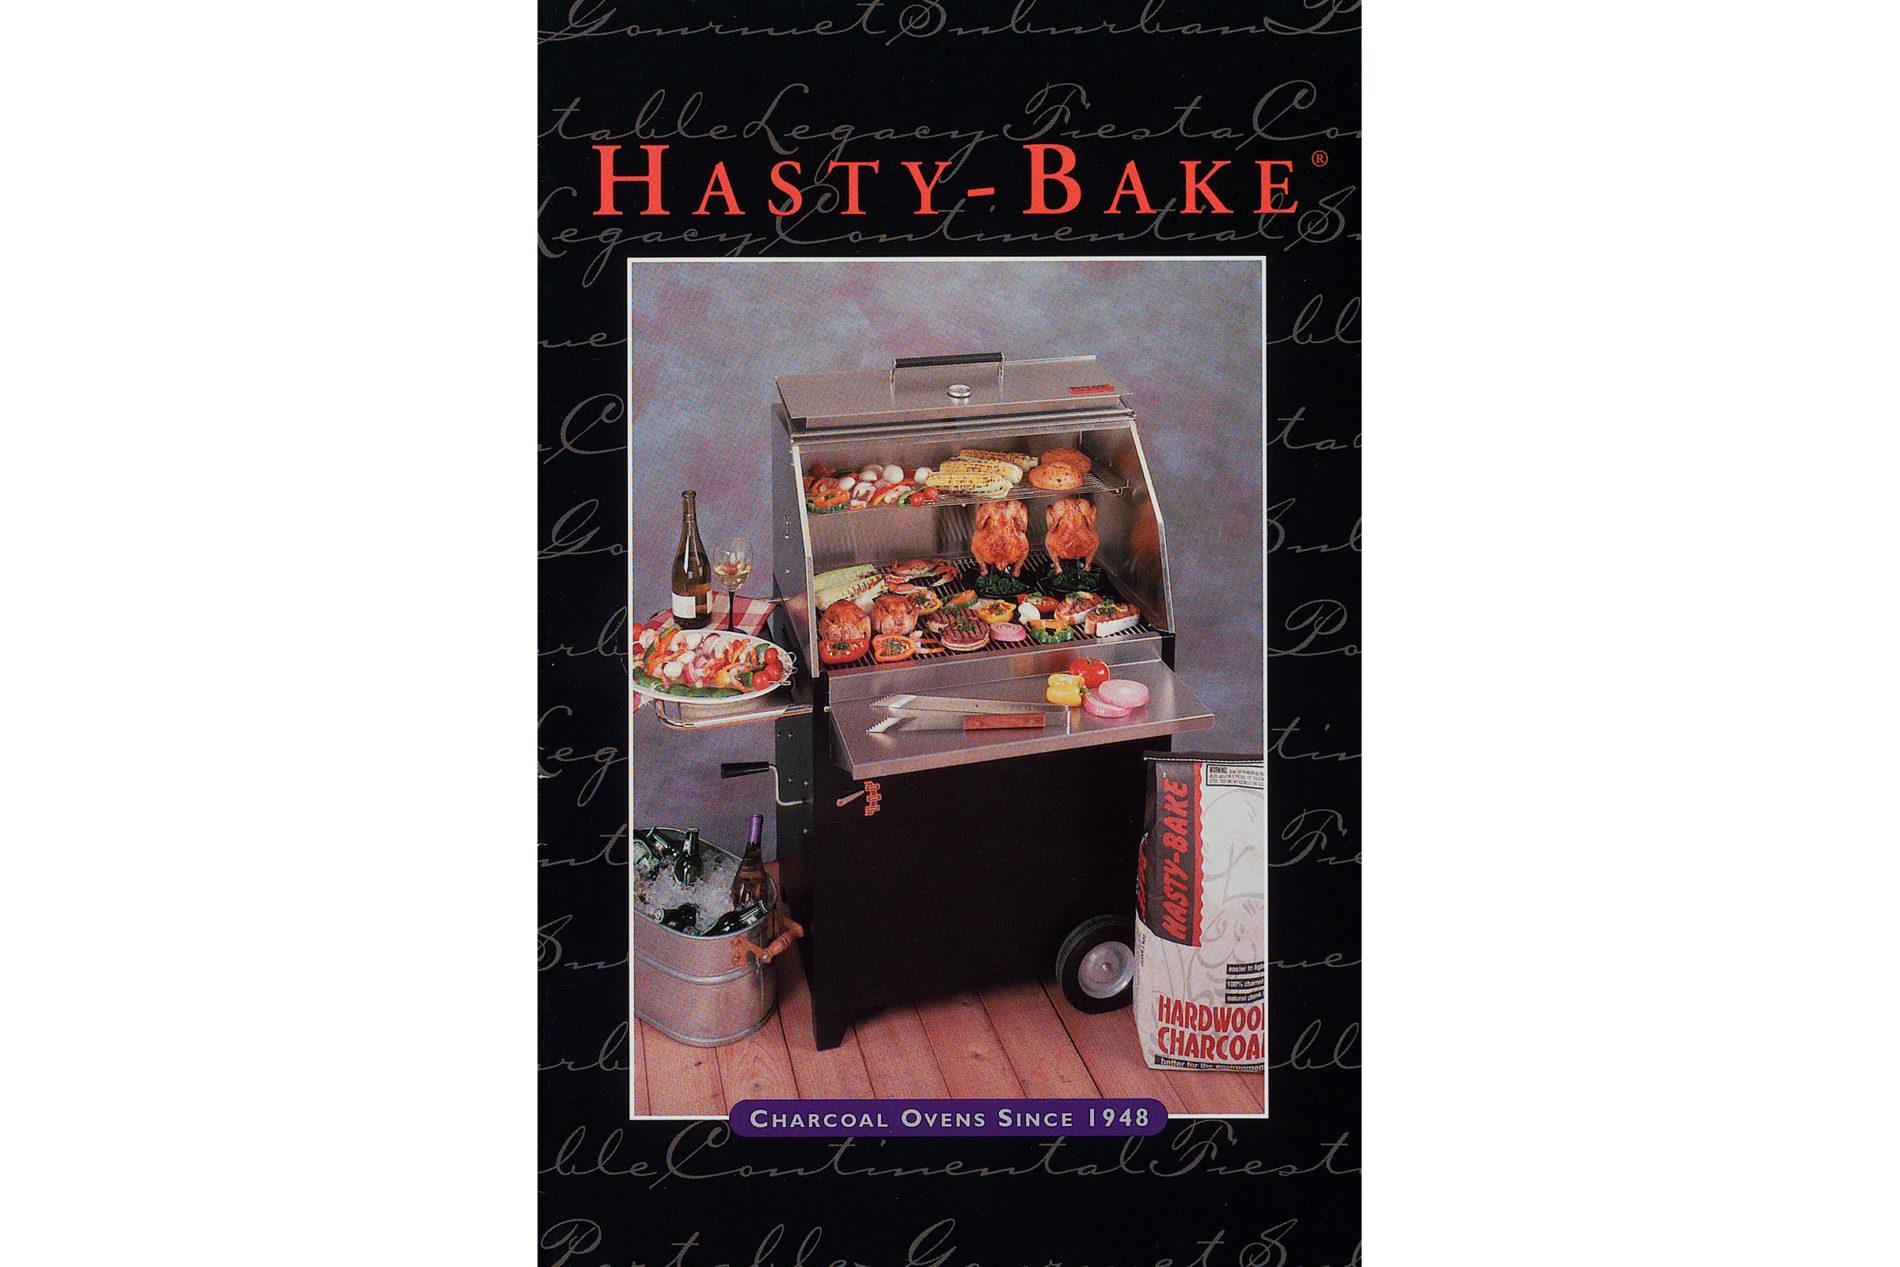 Hasty Bake Catalog